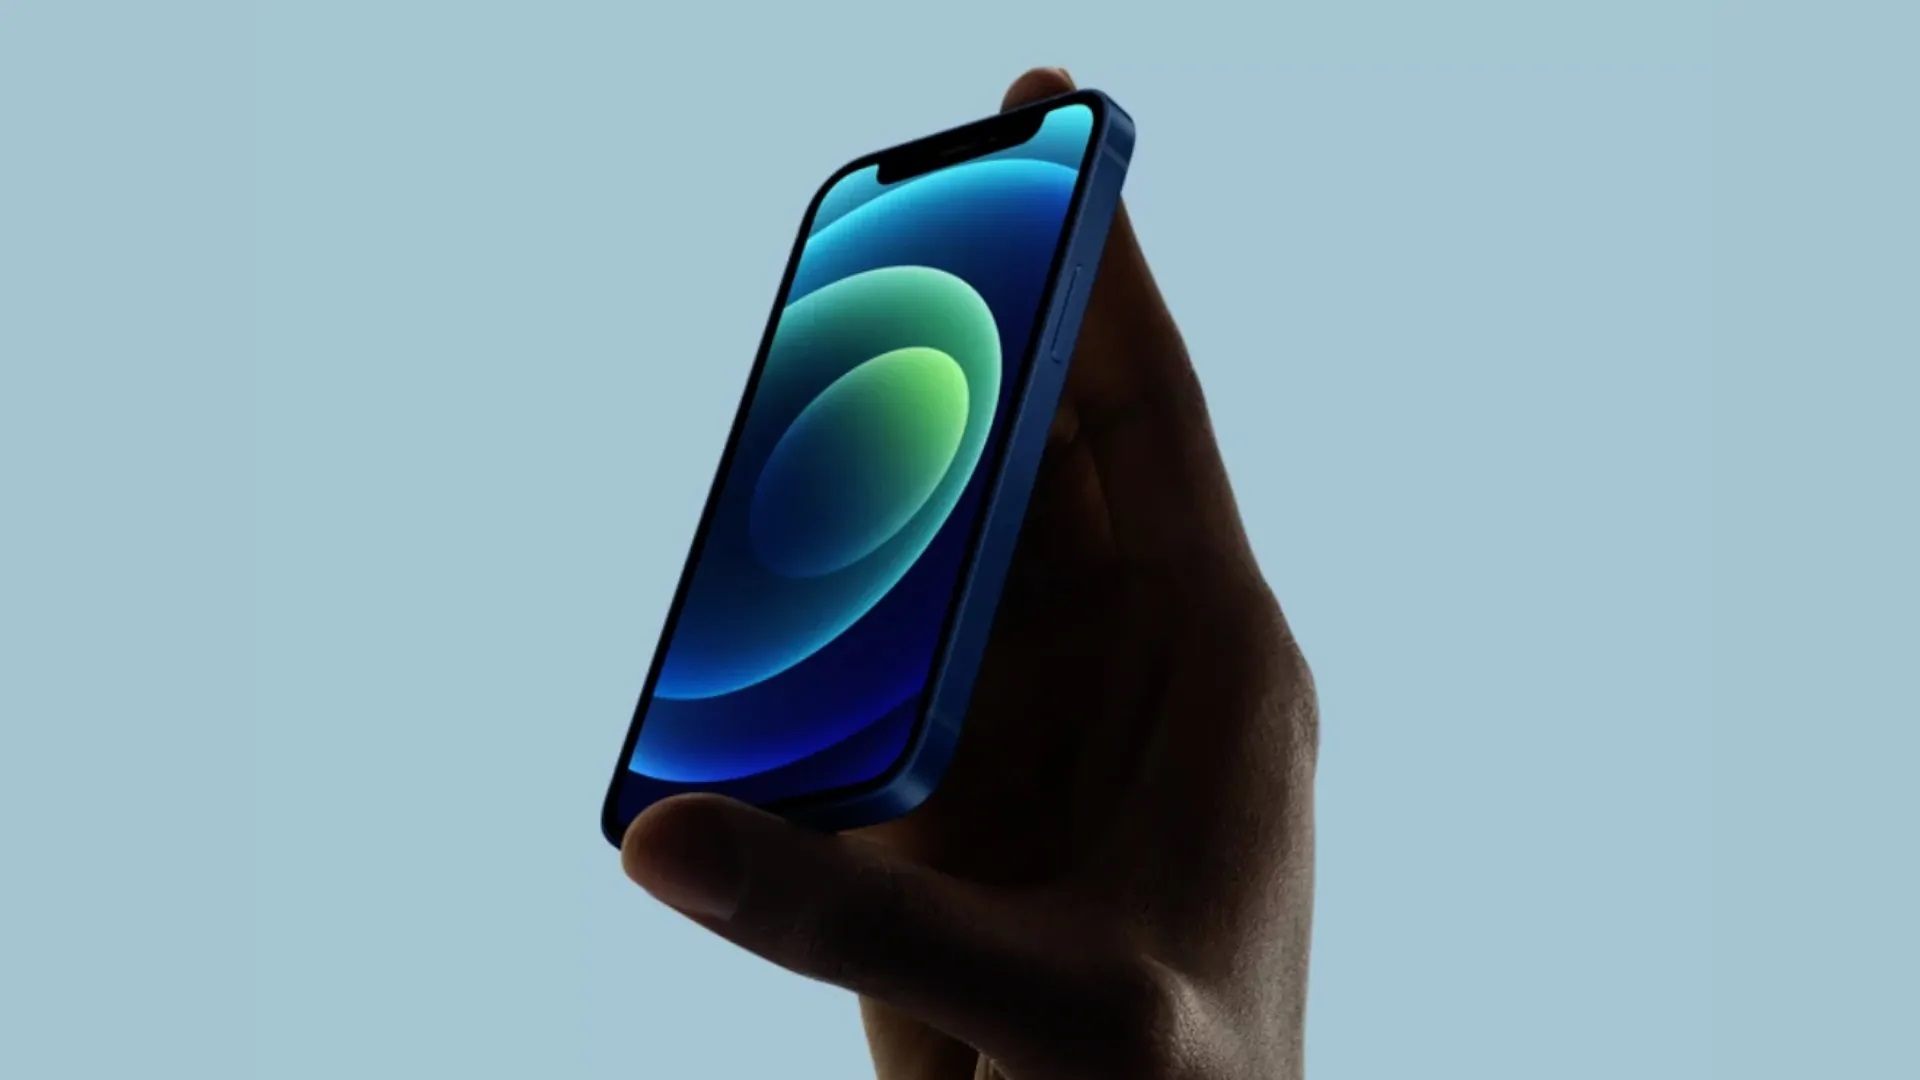 Смартфоны линейки iPhone 12 провалили тест скорости 5G, уступив конкурентам с Android